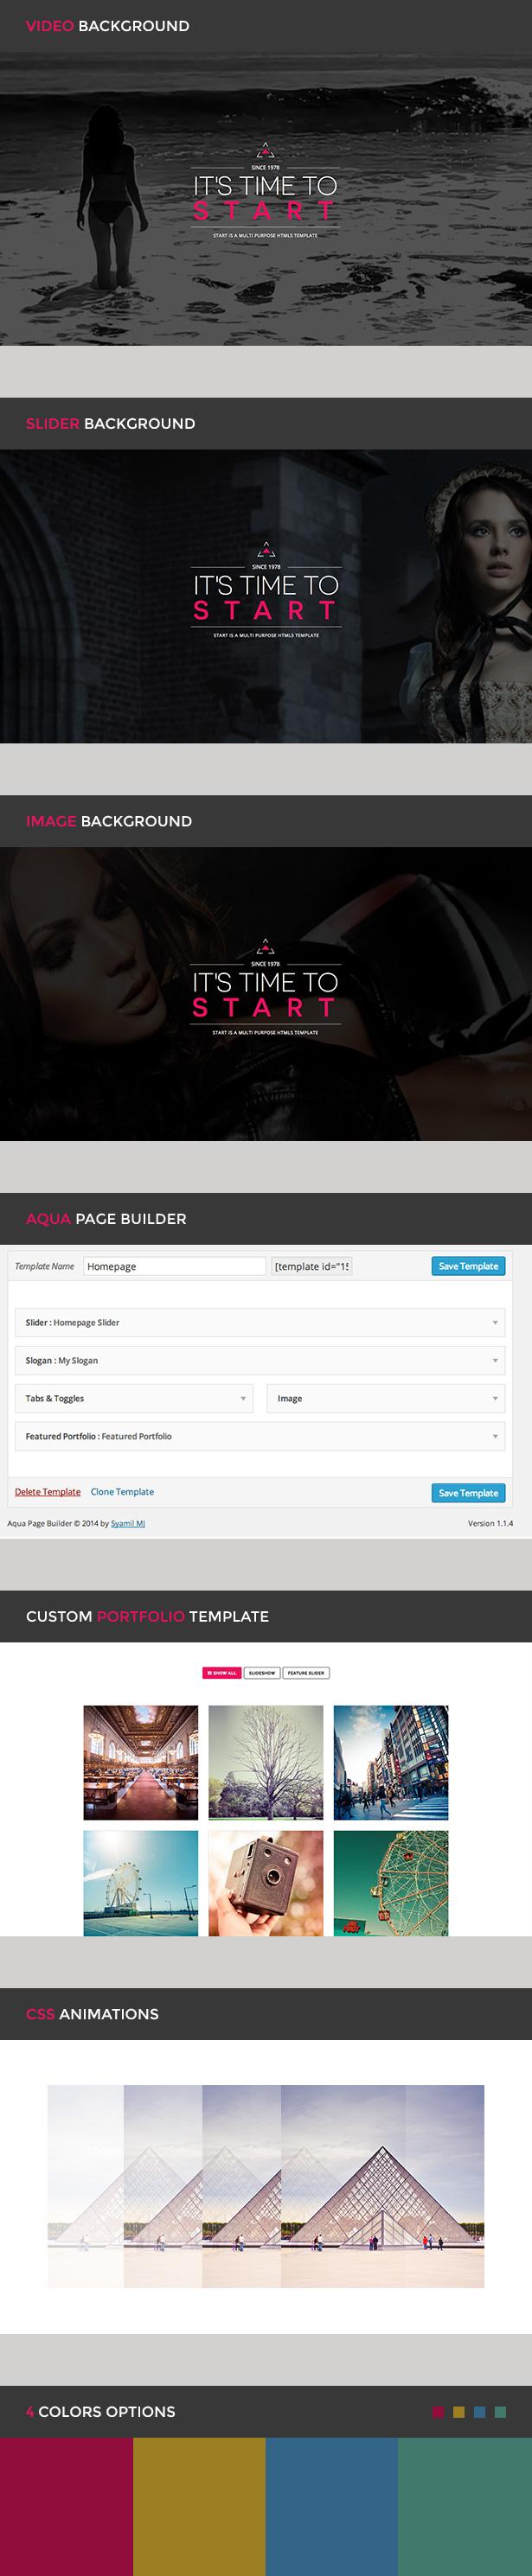 WordPress theme Start - One Page Responsive WordPress Theme (Creative)